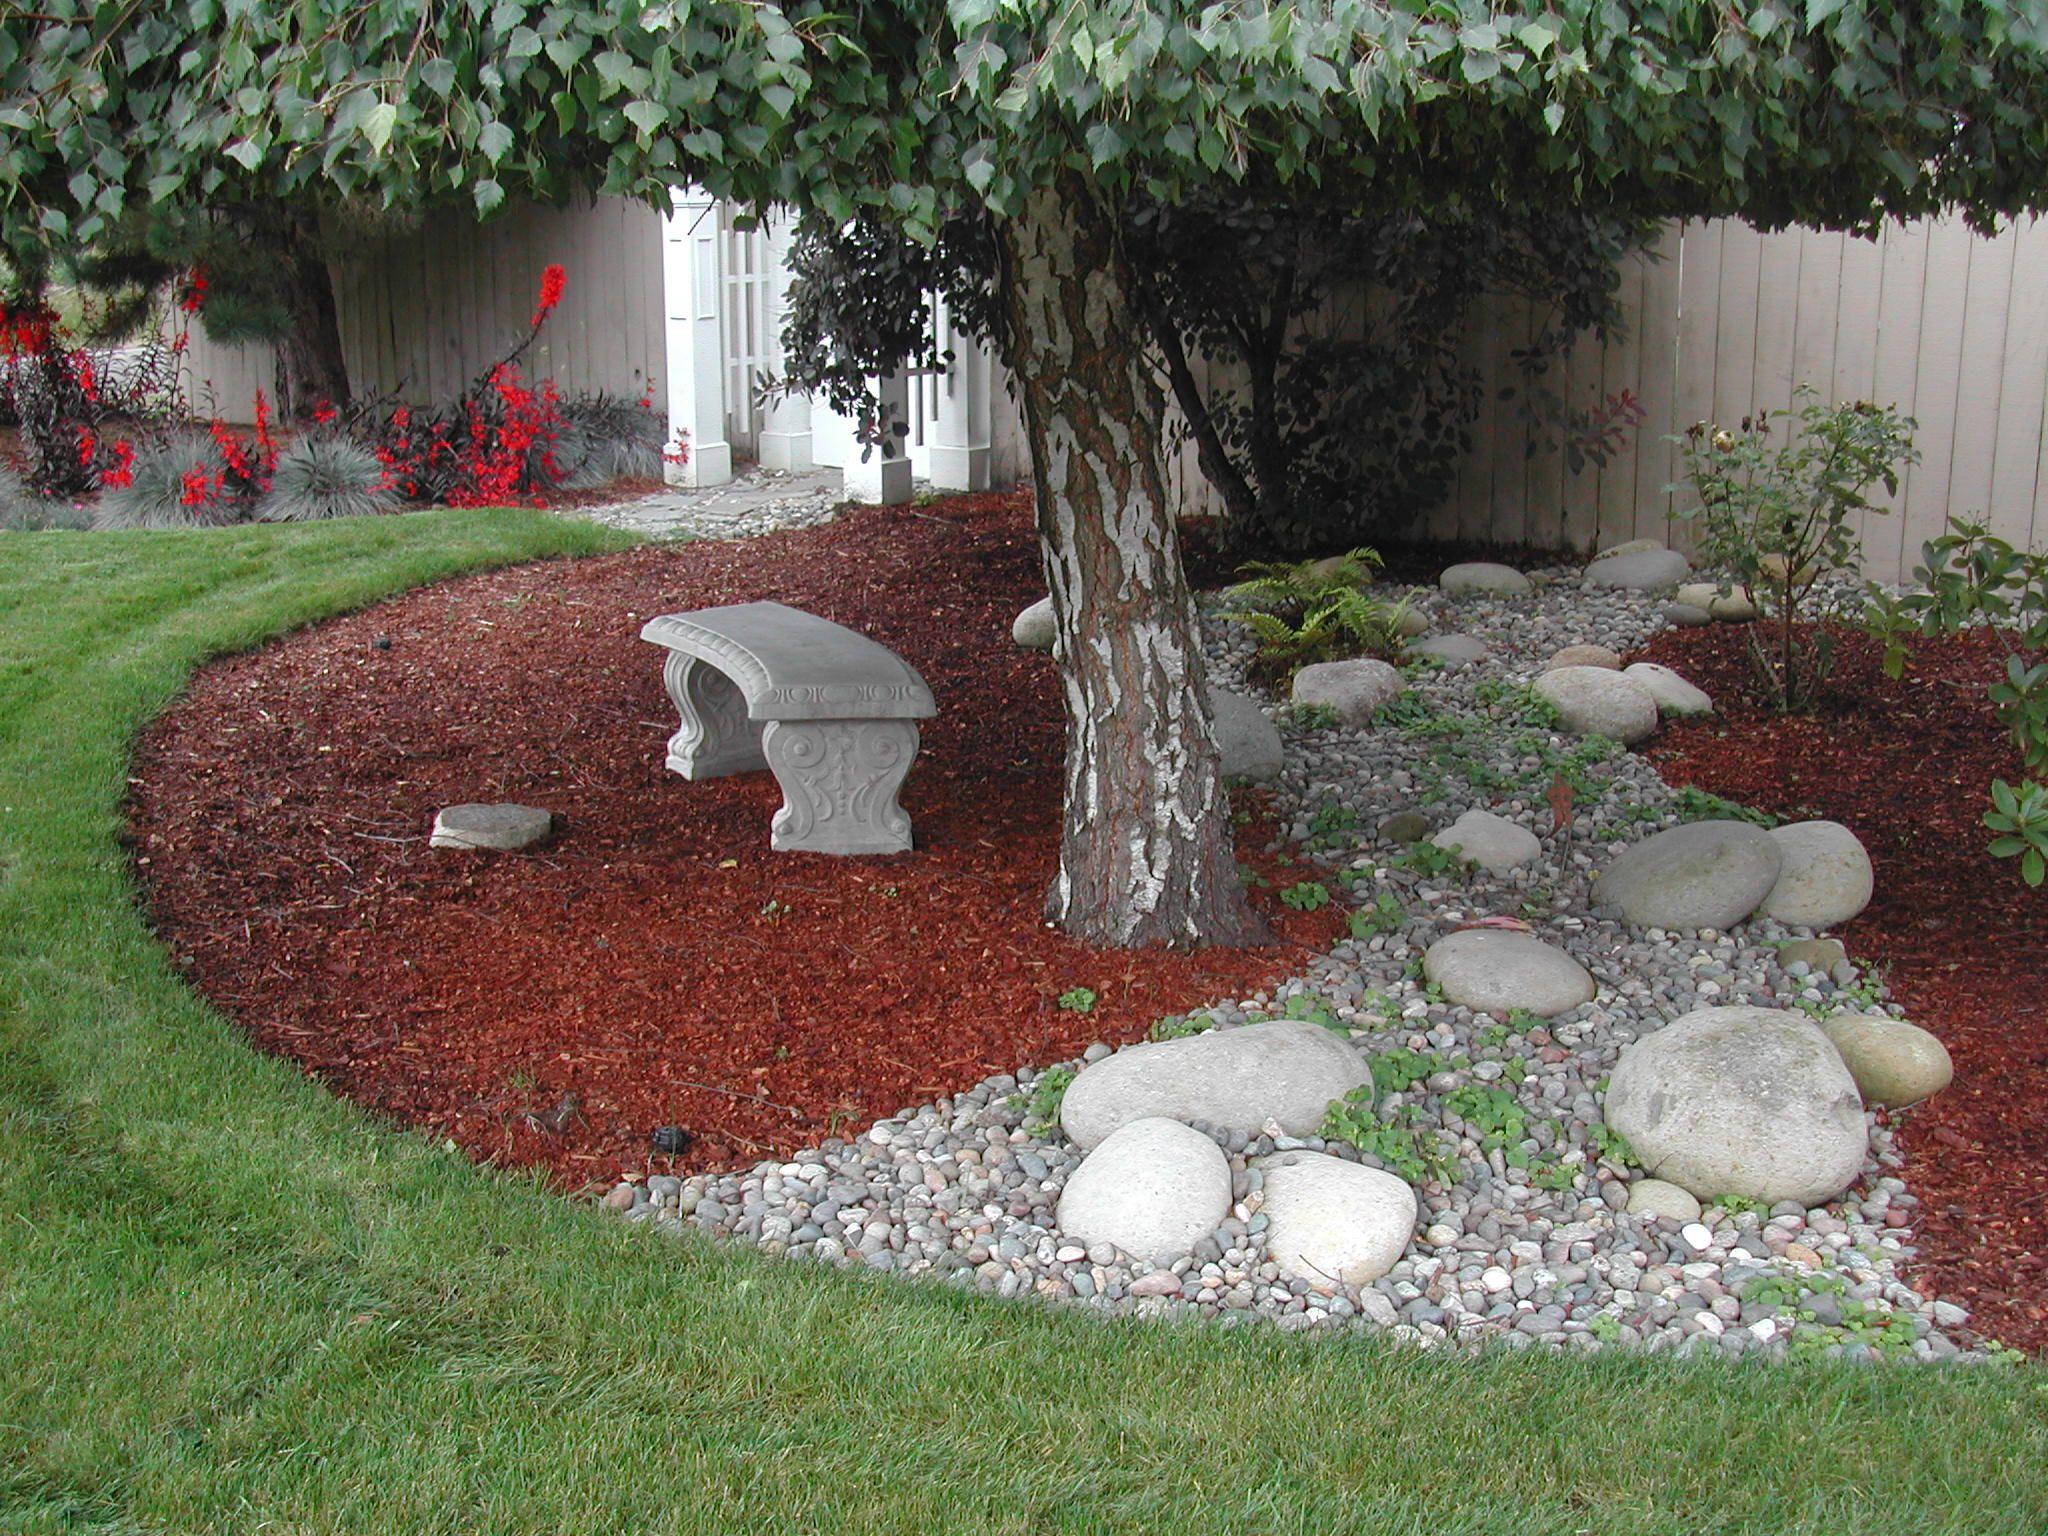 Grass Bark Backyard Landscape Ideas For Small Yards Laurieflower